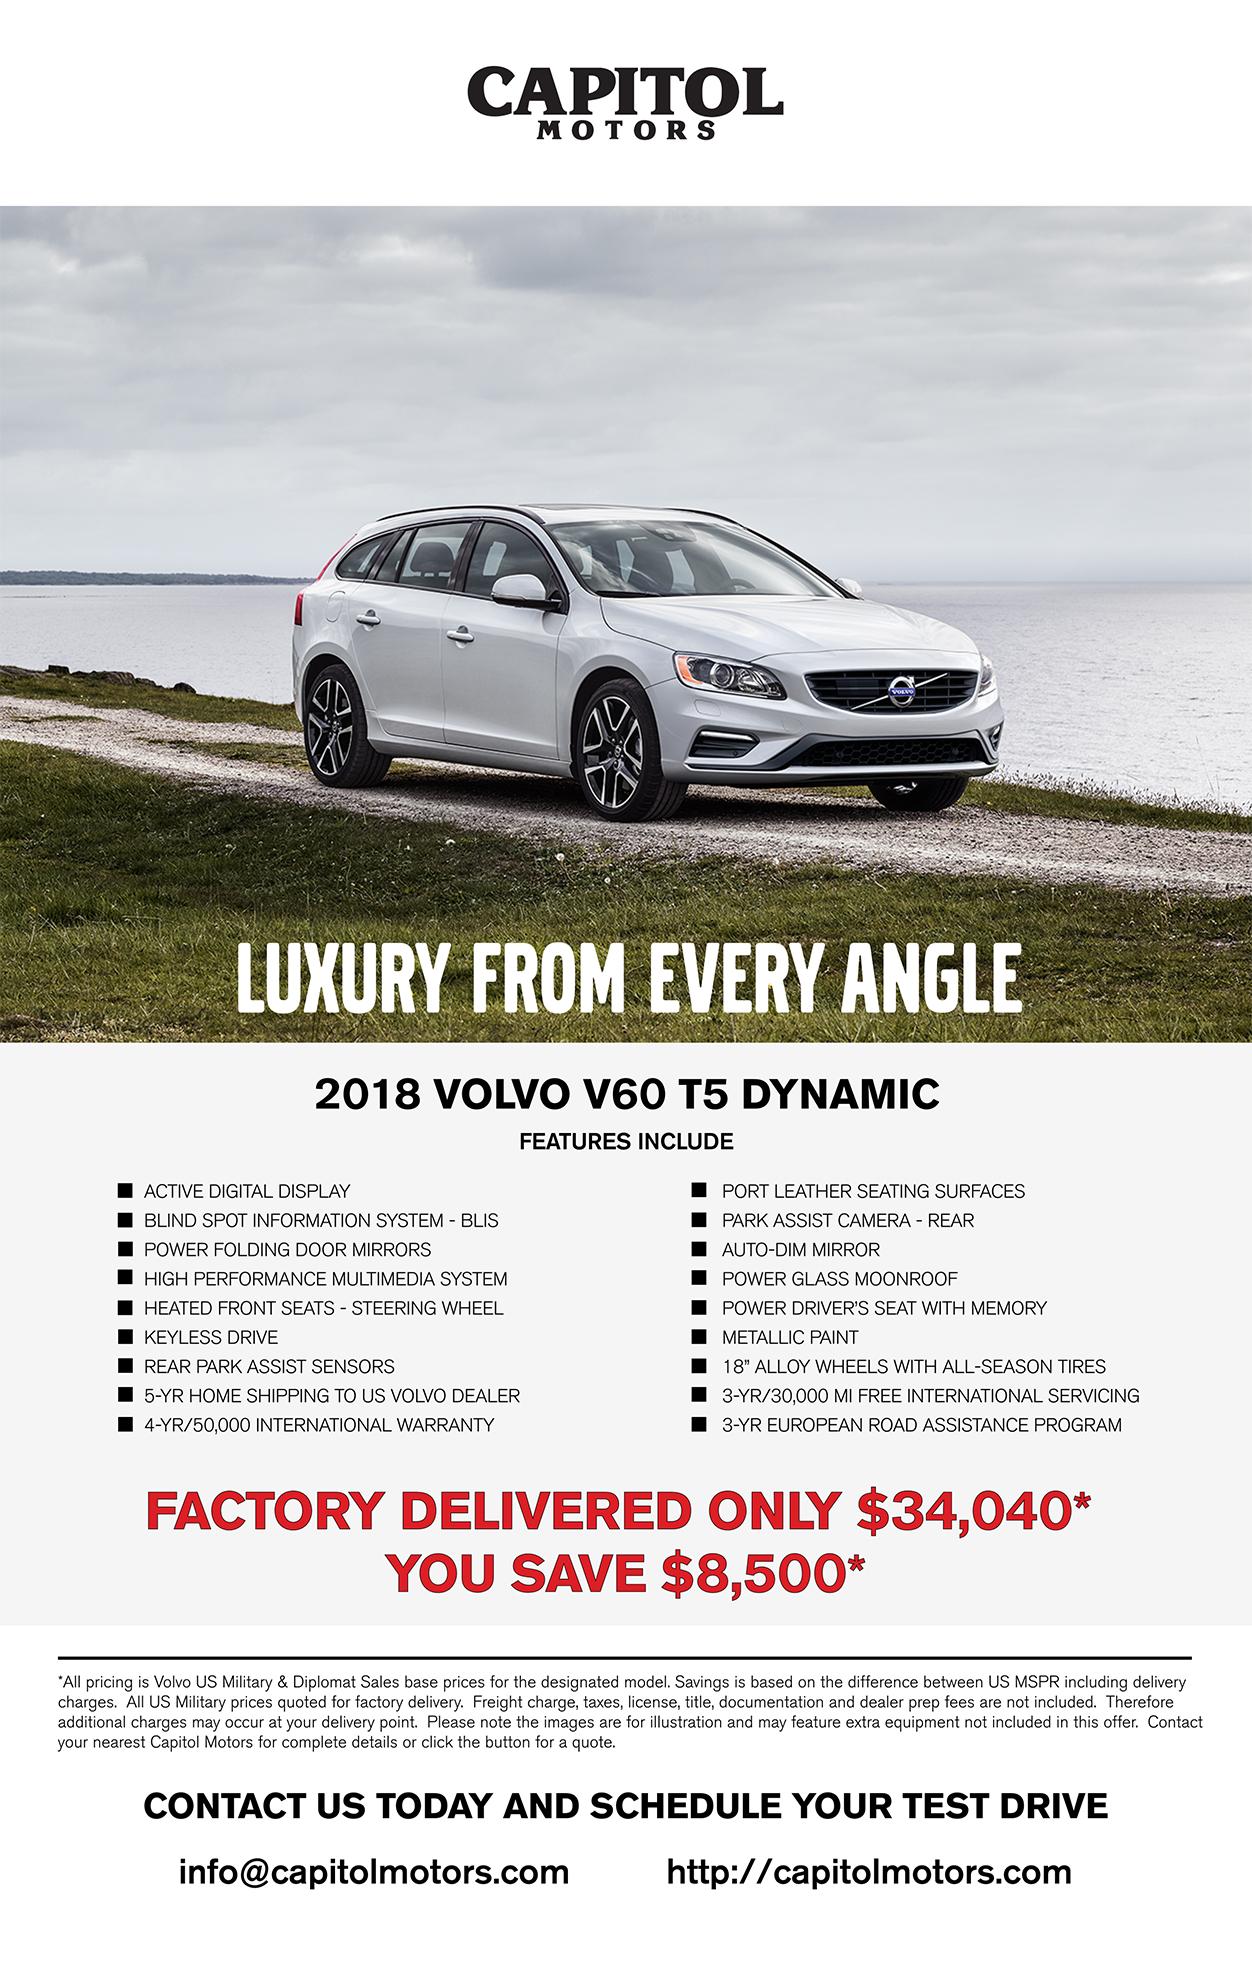 Capitol_Motors_Volvo_2018_V60_LUXURY-OFFER_Aug17